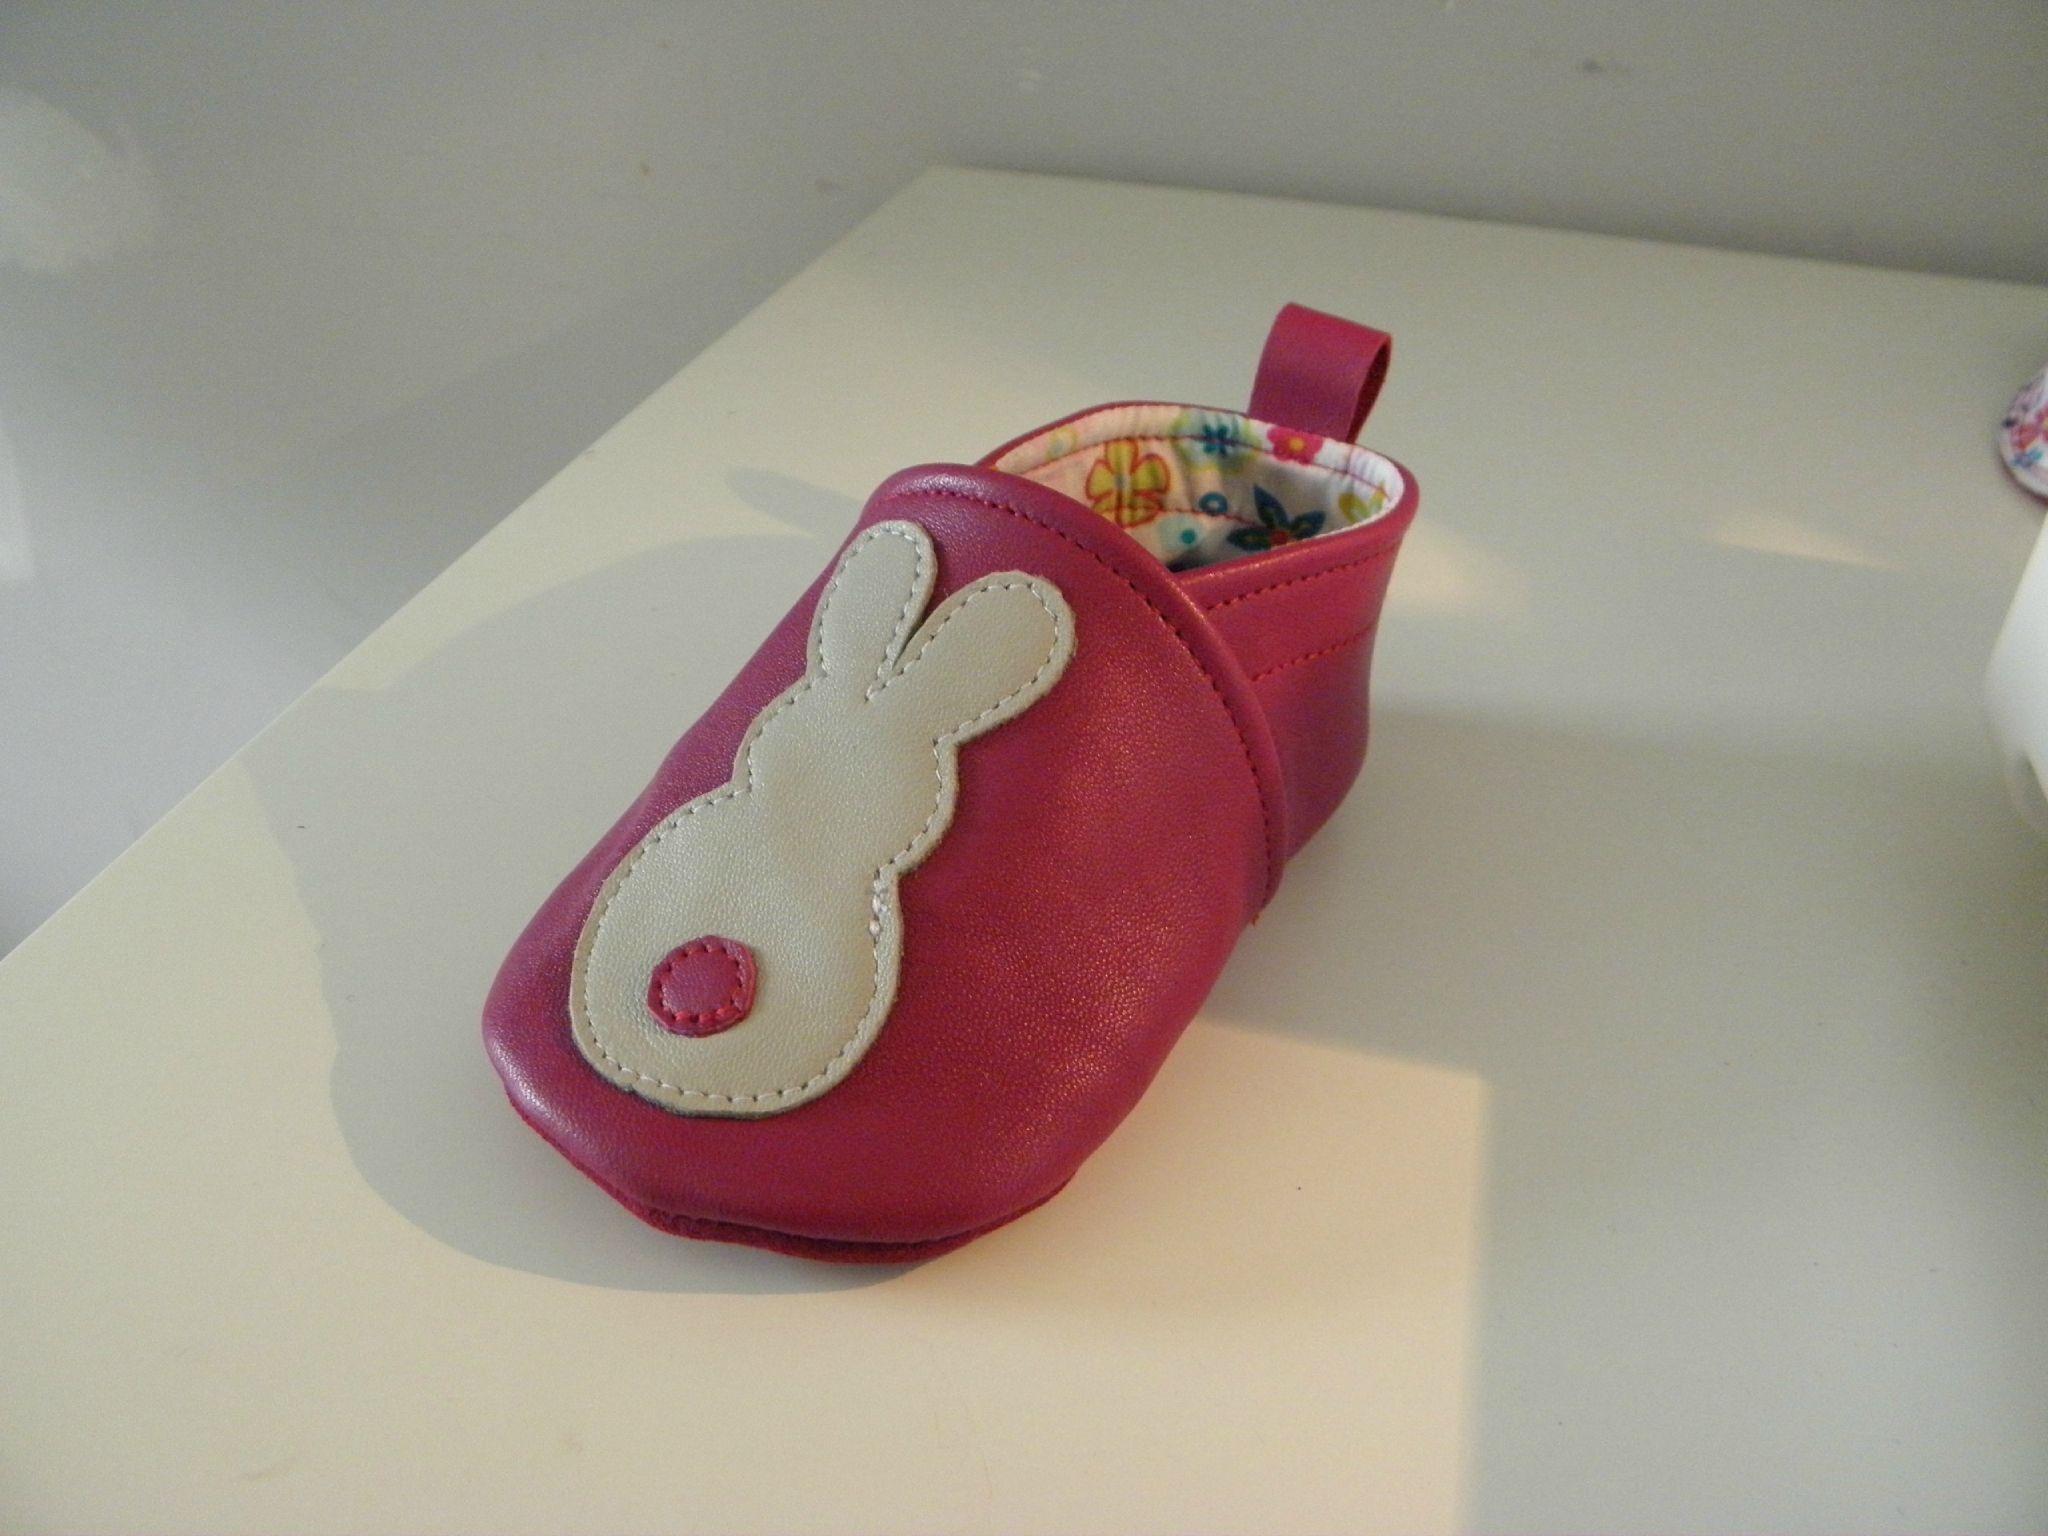 Tuto chaussons b b s couture pinterest tuto chausson - Tuto chausson bebe couture ...